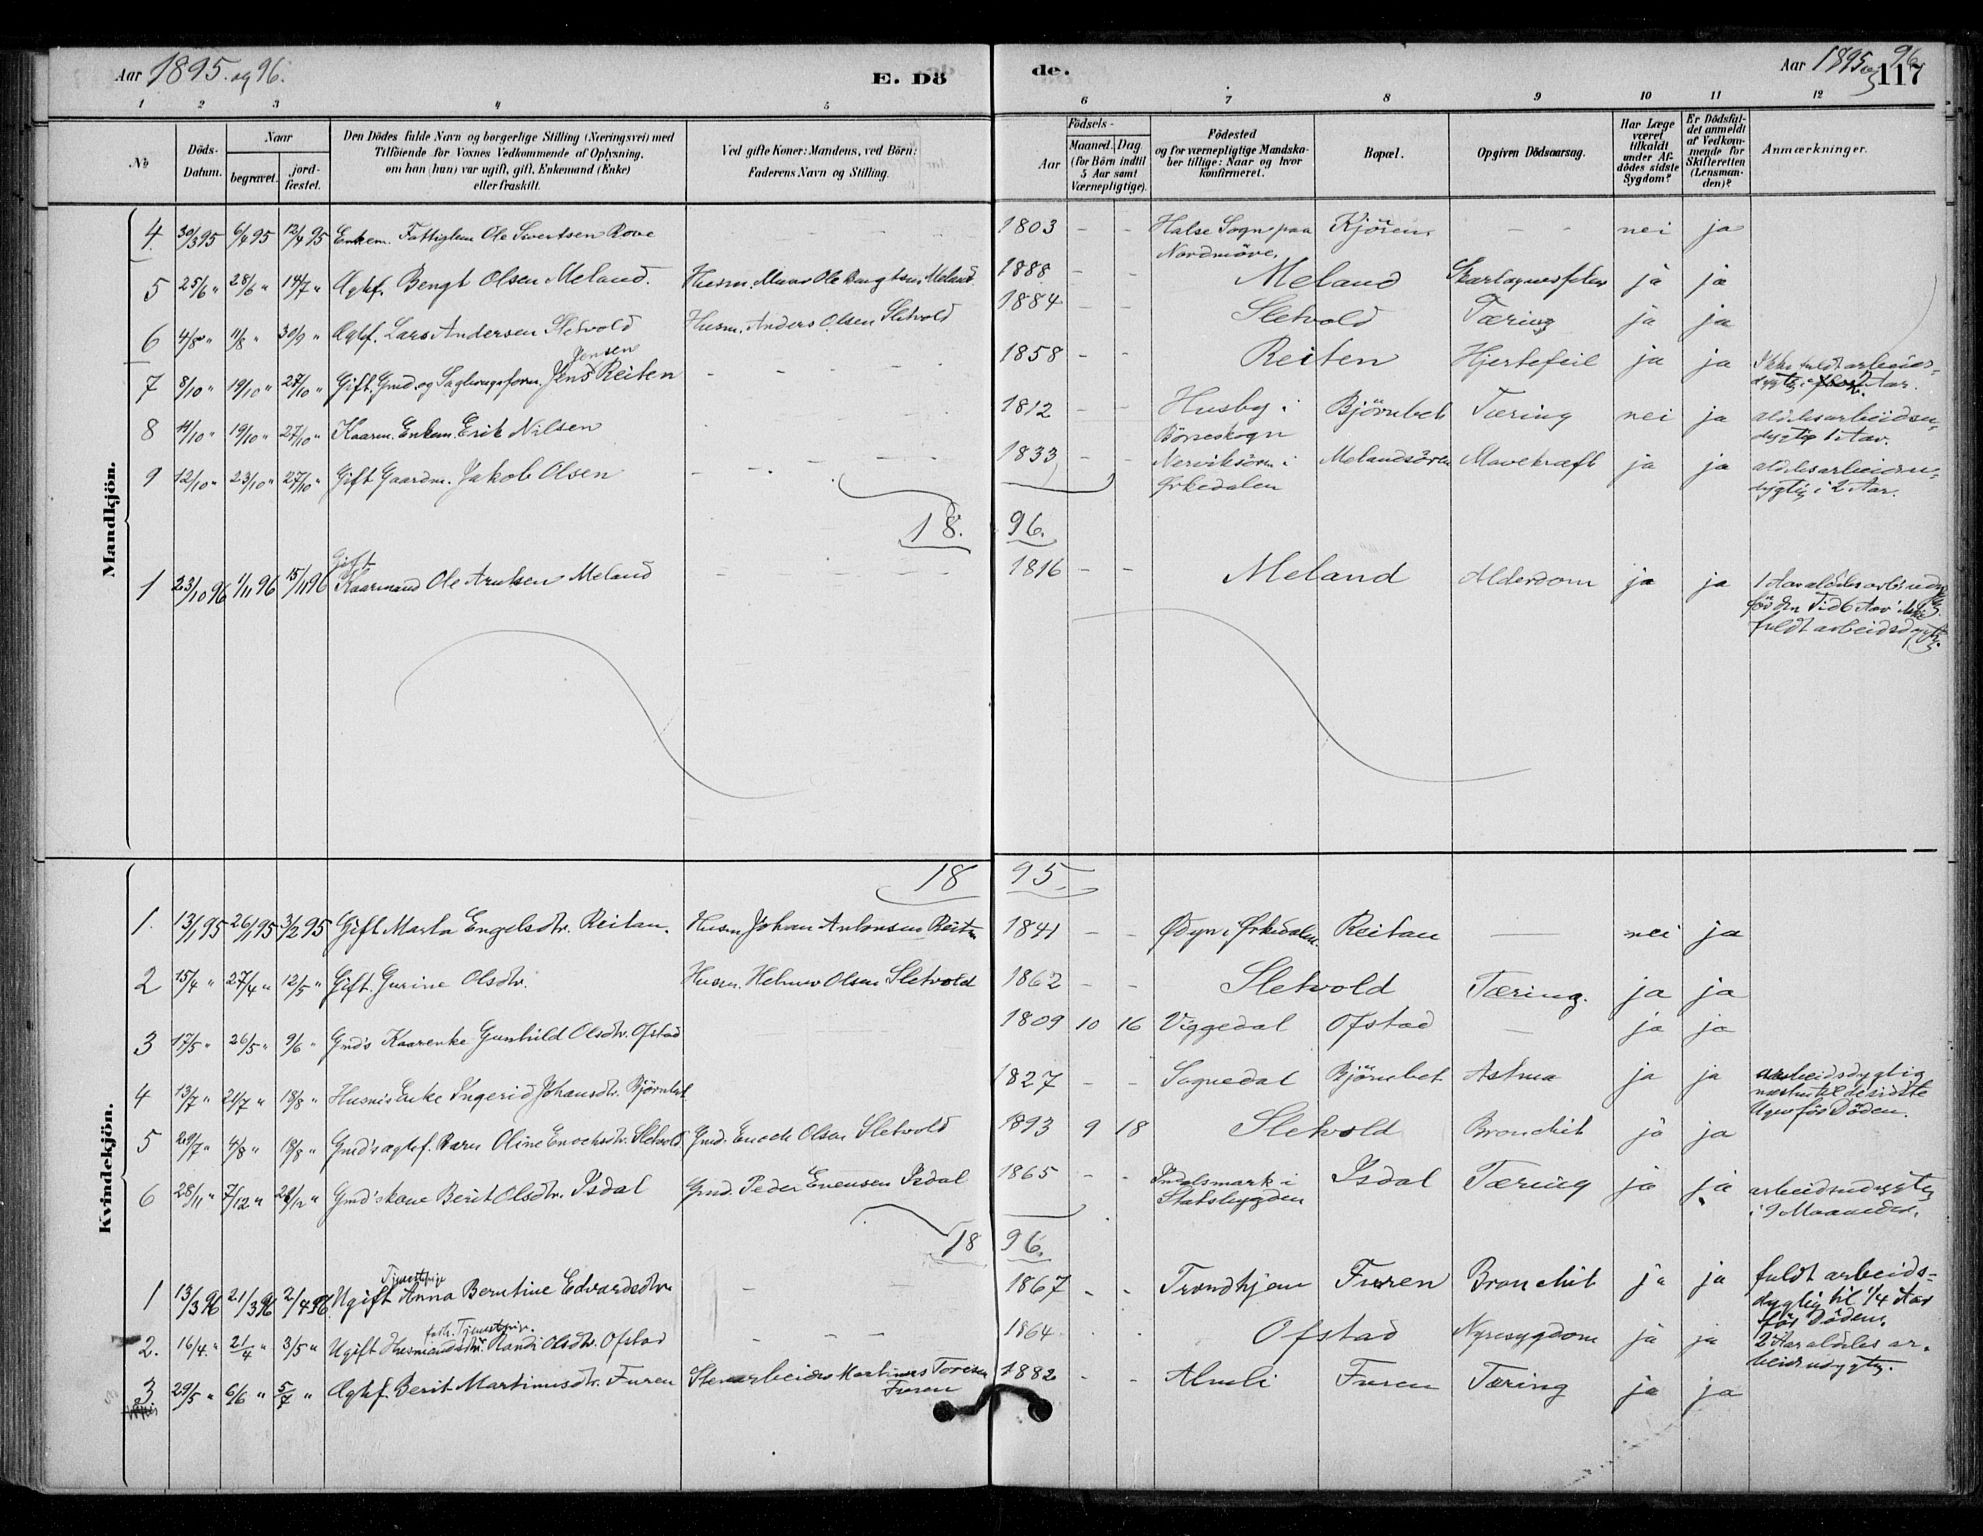 SAT, Ministerialprotokoller, klokkerbøker og fødselsregistre - Sør-Trøndelag, 670/L0836: Parish register (official) no. 670A01, 1879-1904, p. 117